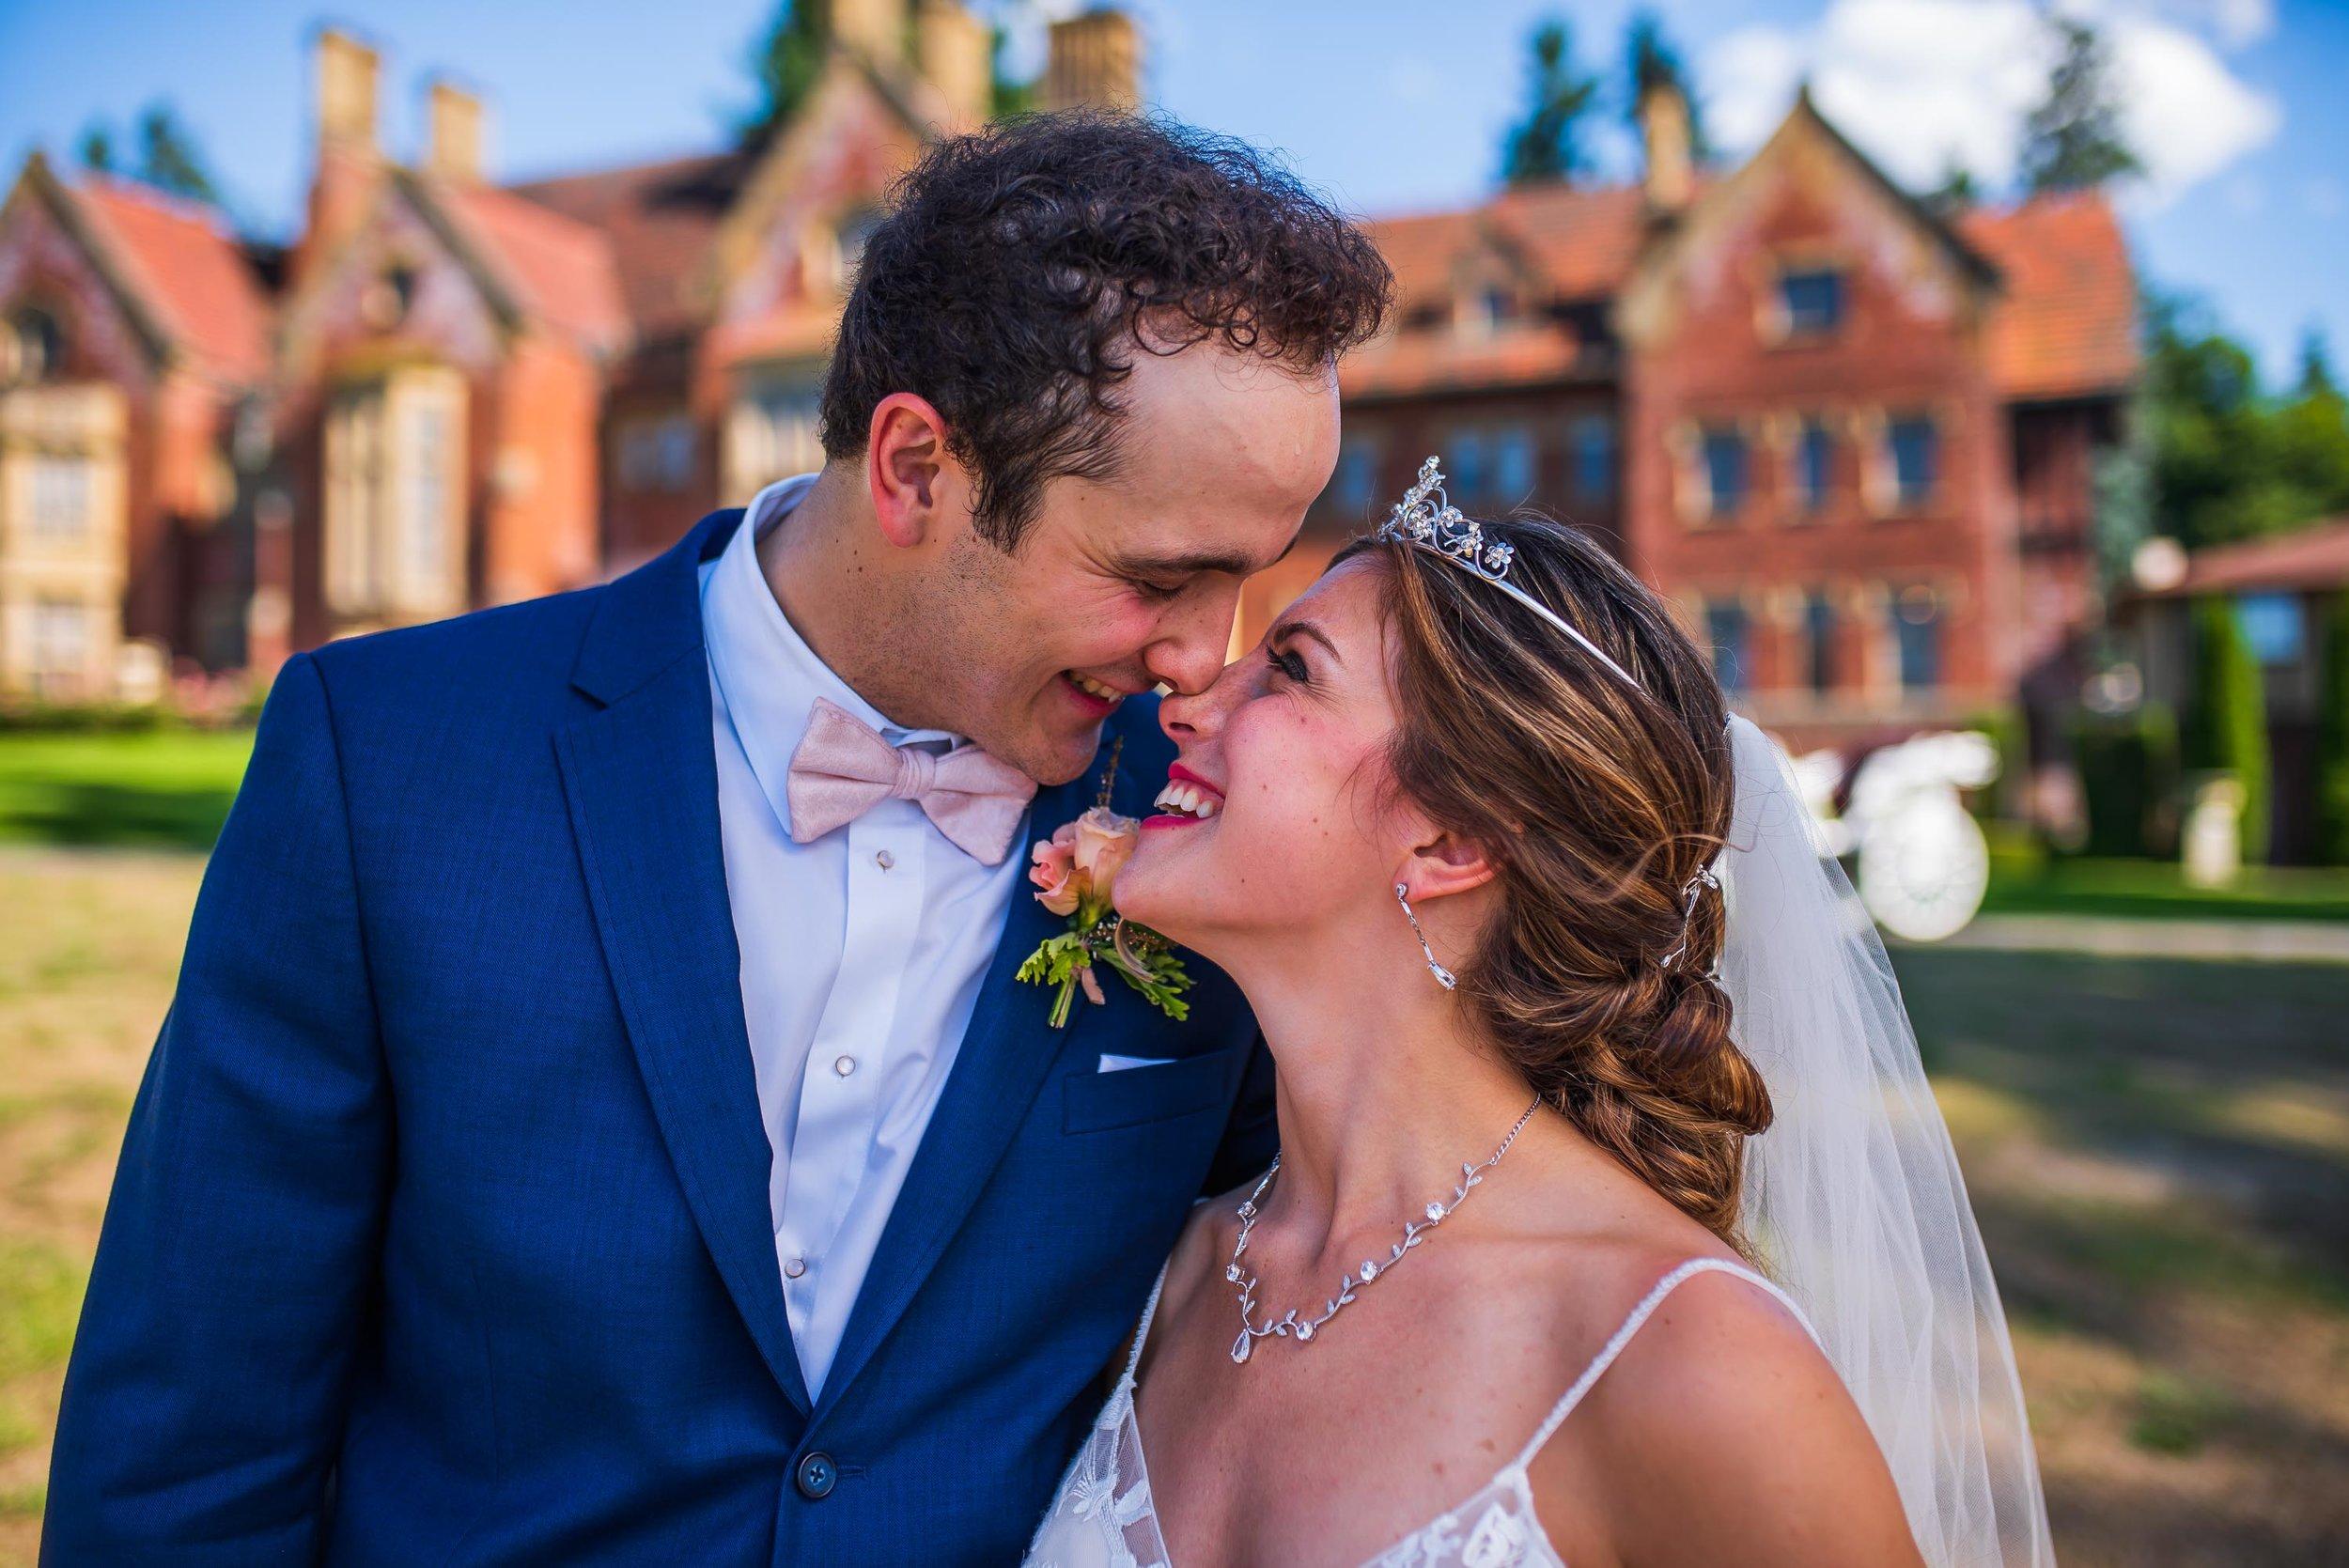 thornewood castle wedding 55.jpg